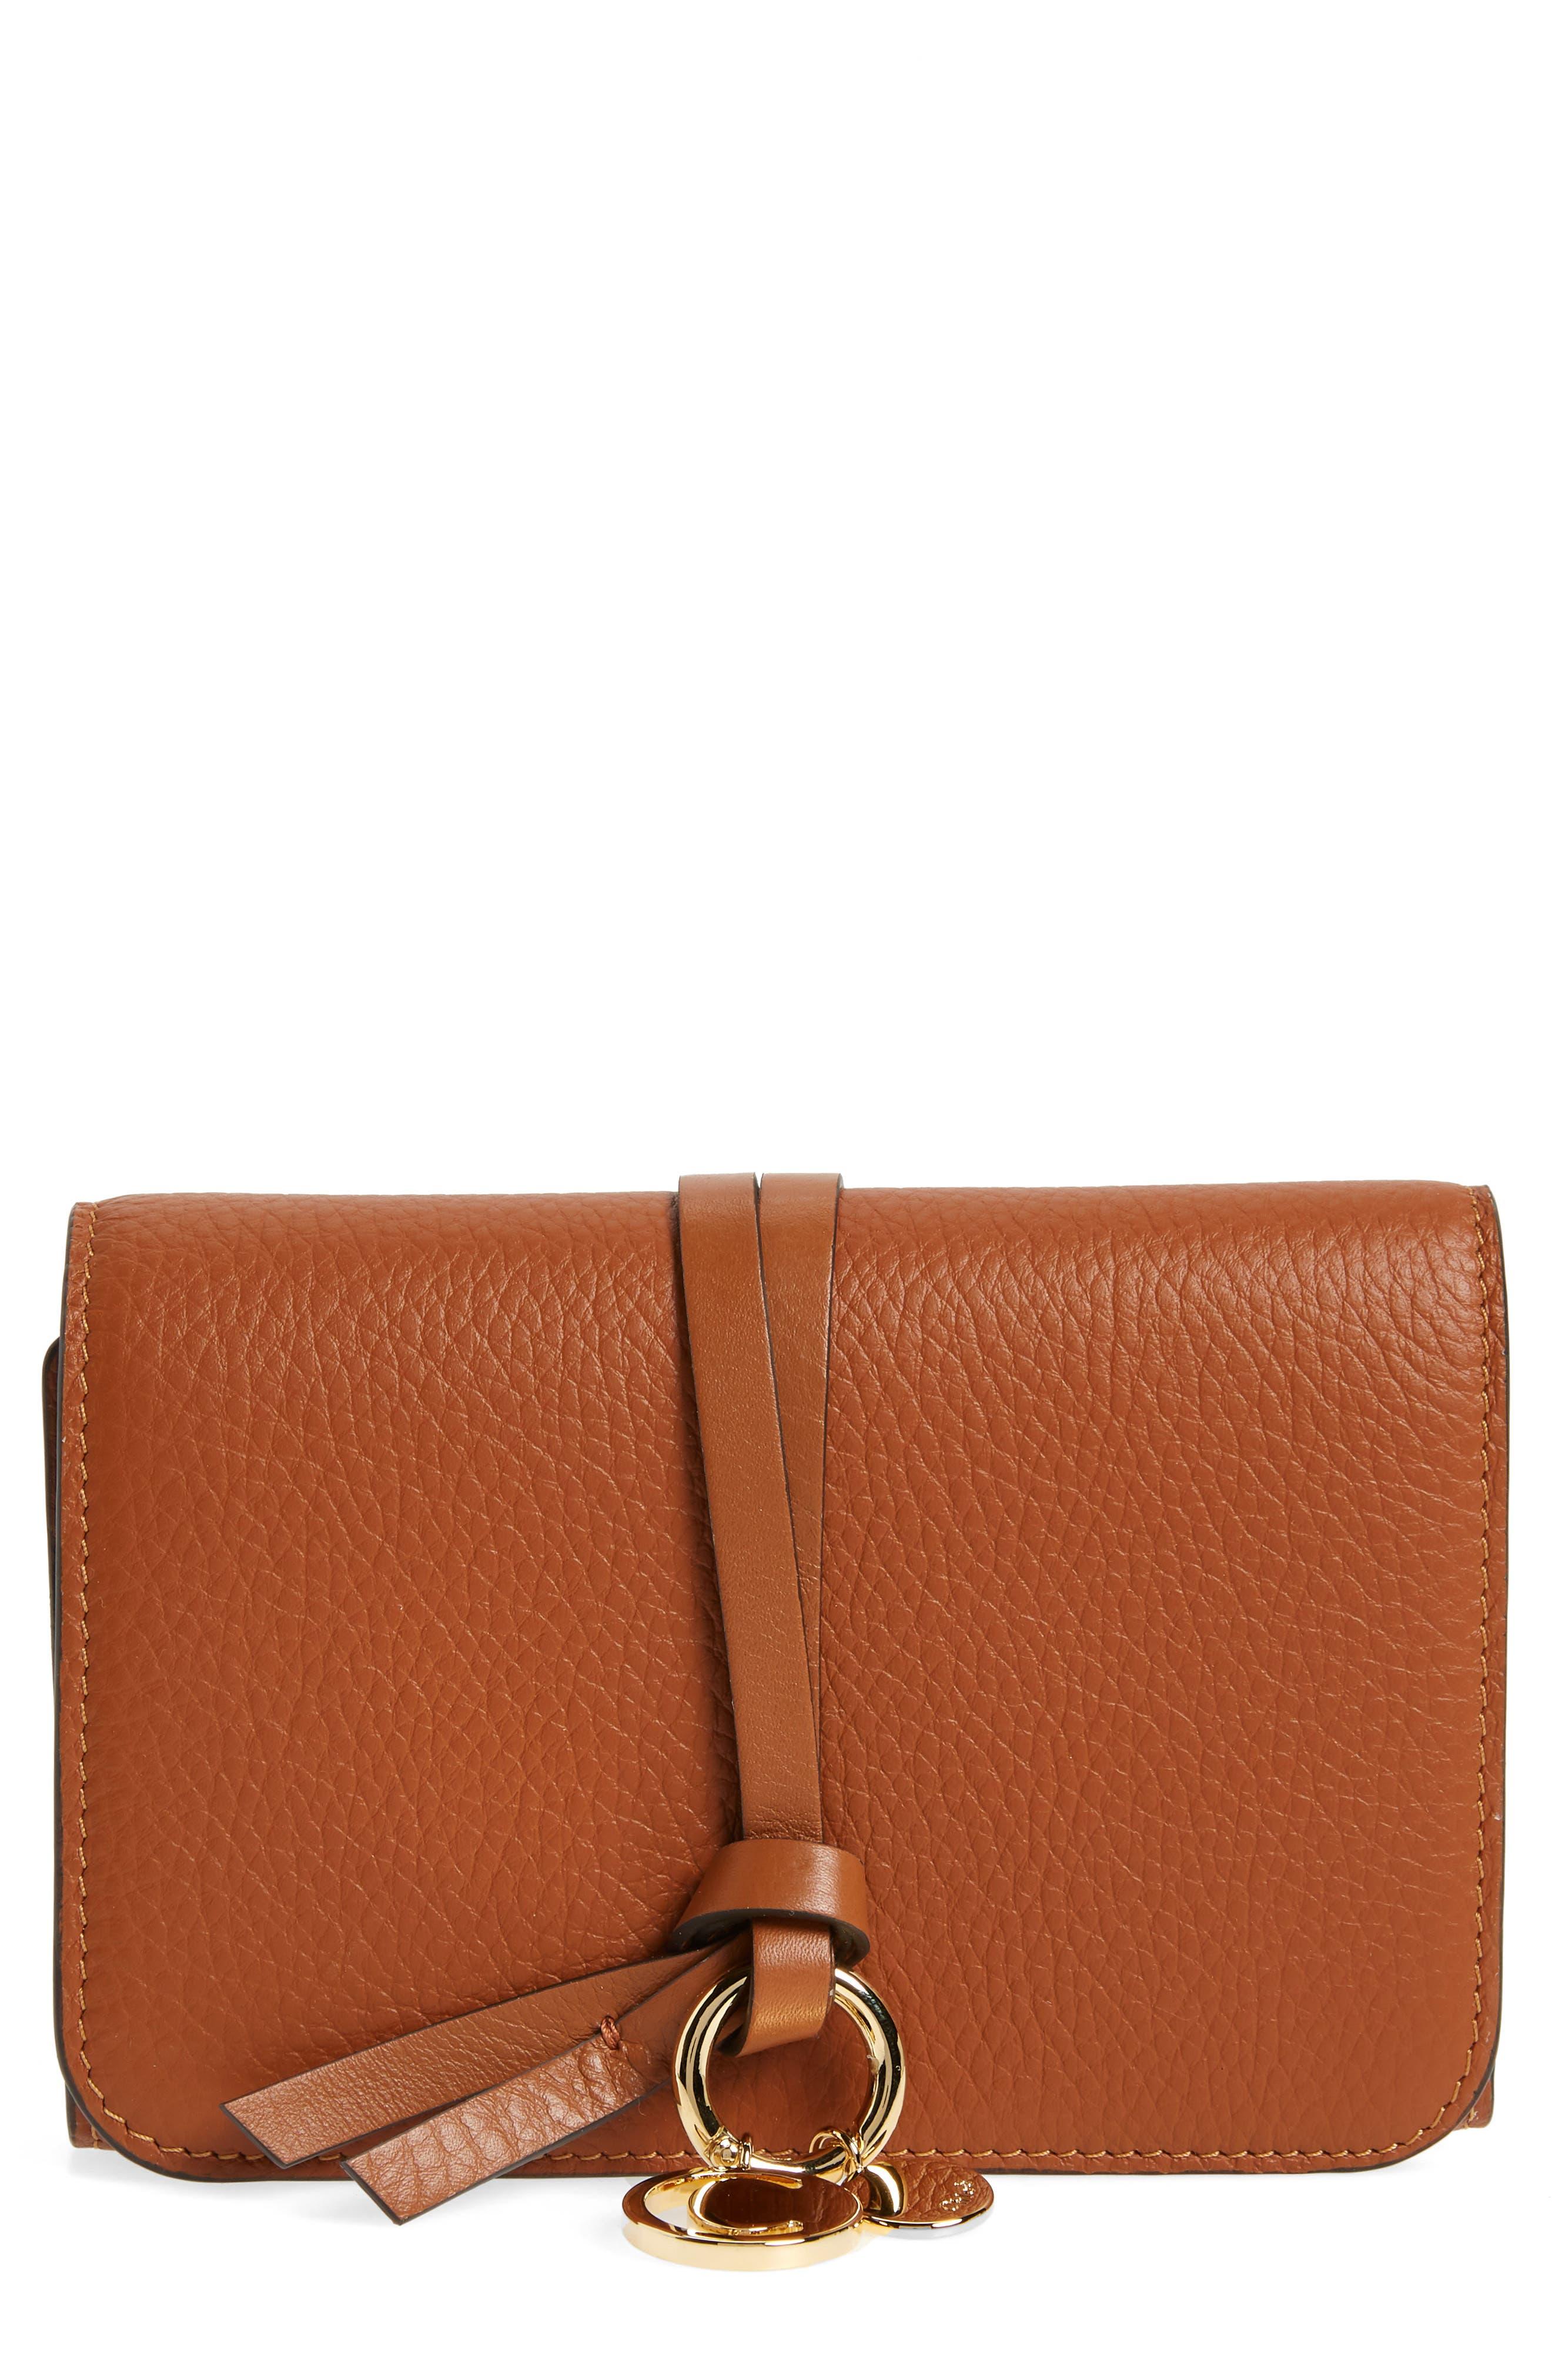 Alphabet Leather Wallet,                         Main,                         color, Tan